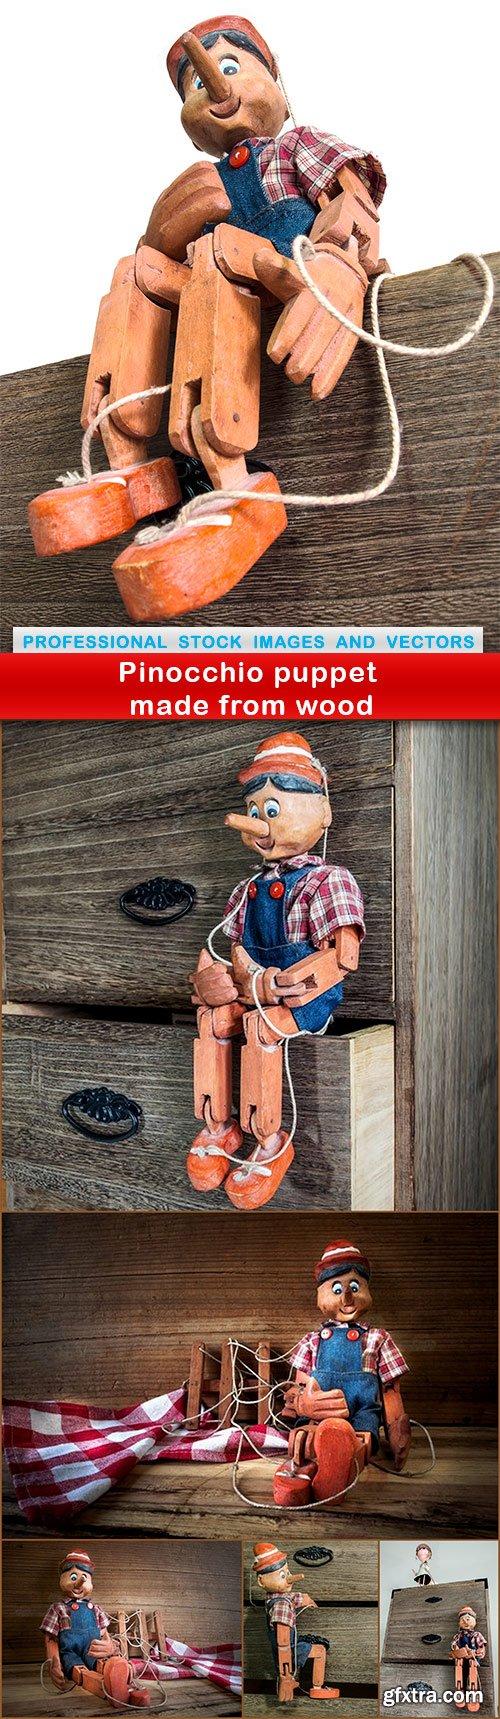 Pinocchio puppet made from wood - 6 UHQ JPEG